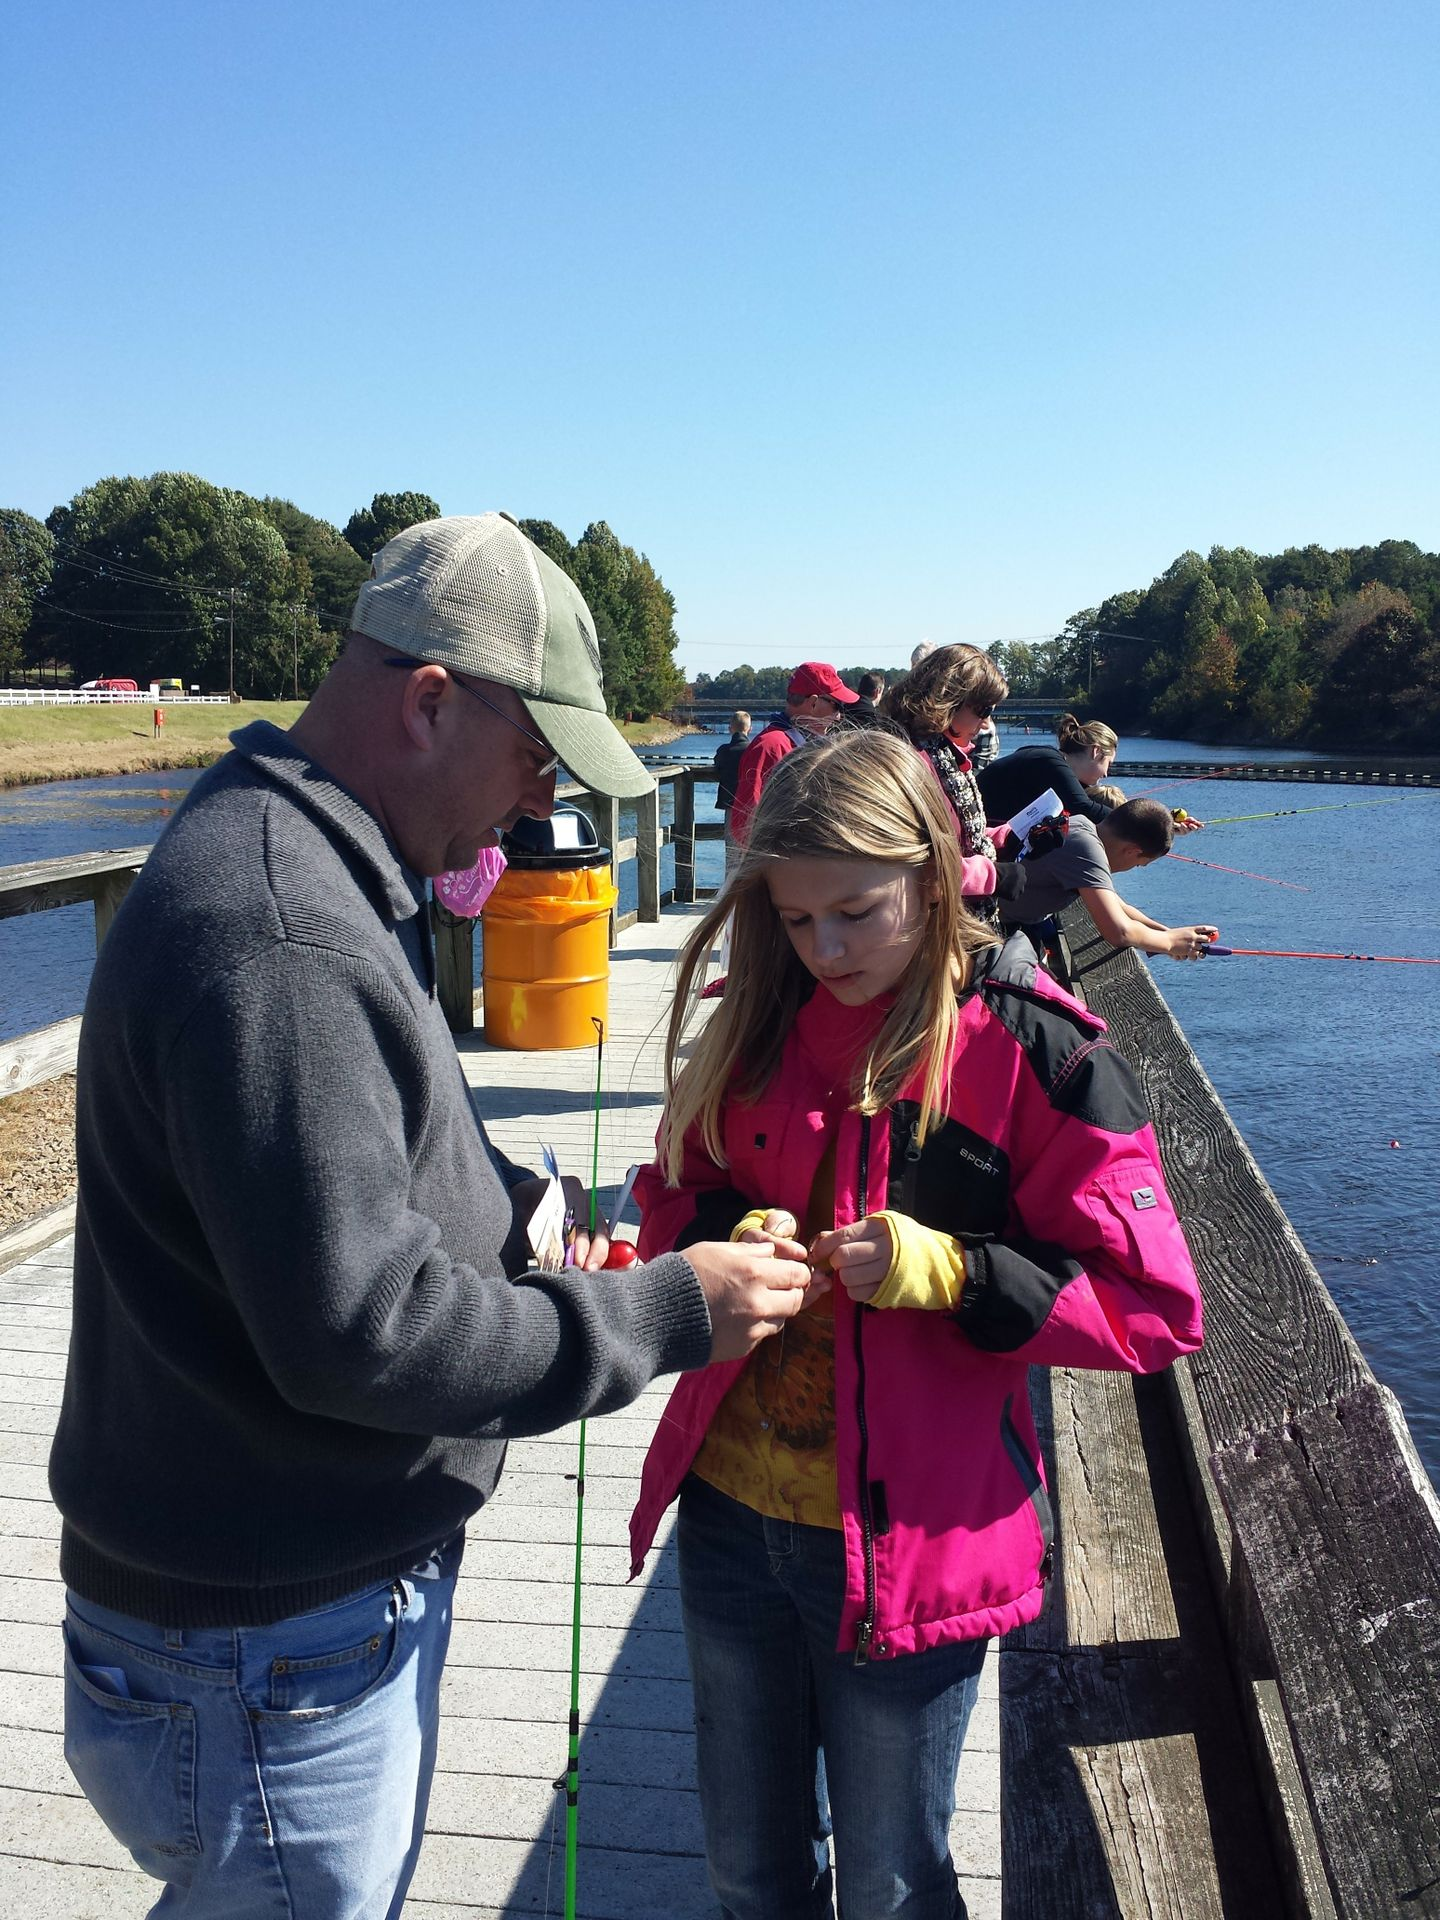 Family fishing at the EnergyExplorium